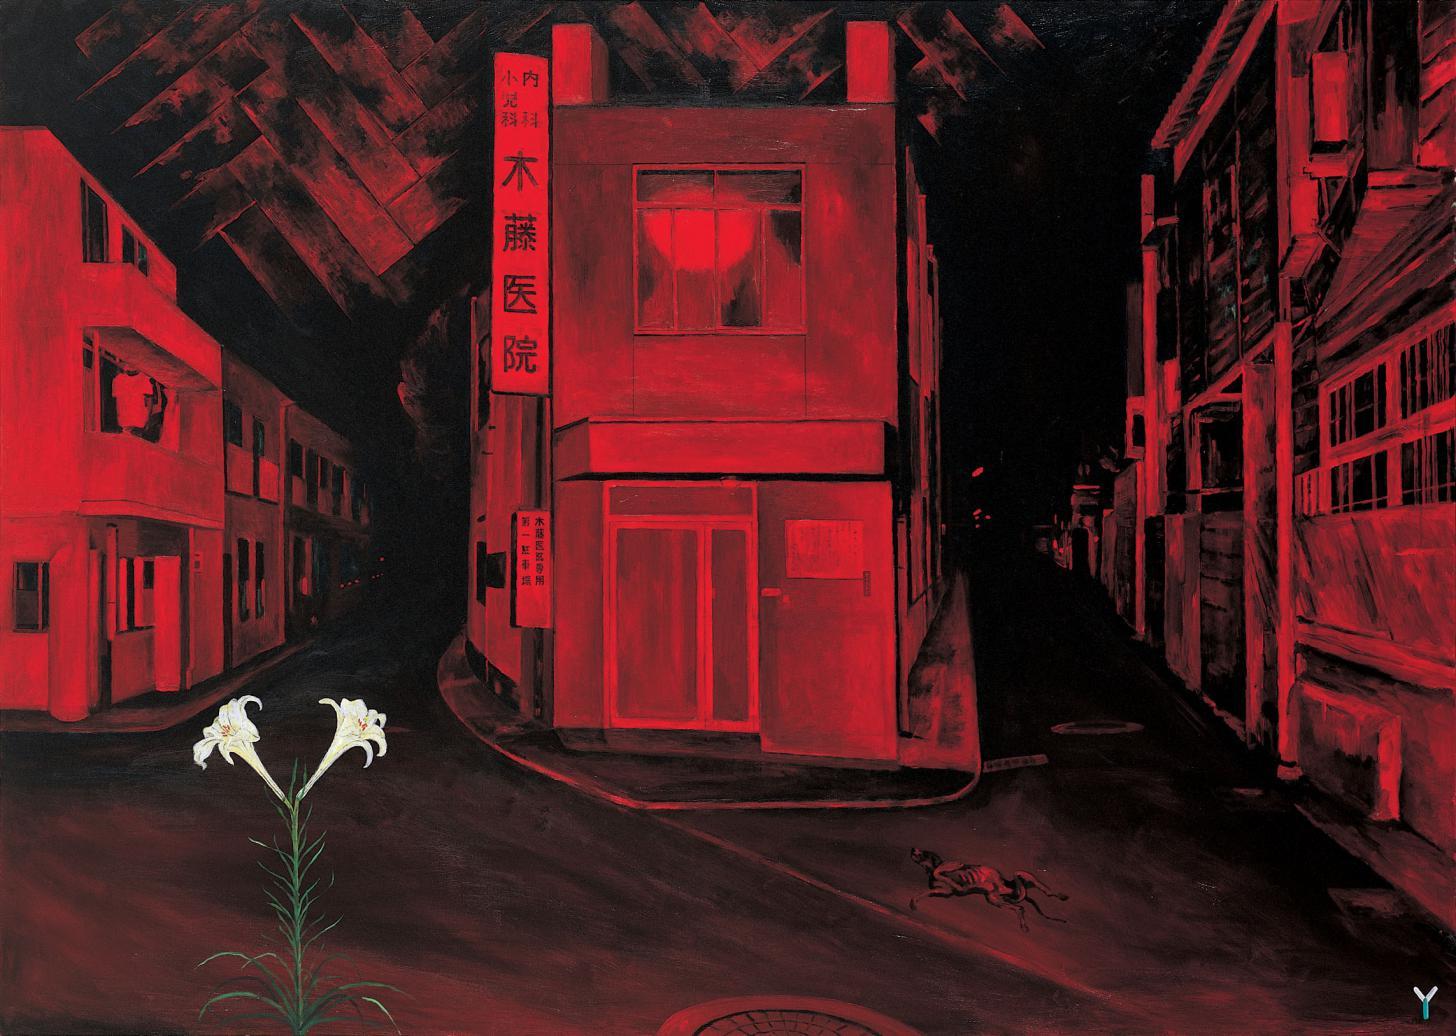 """A dark Night's Flashing : City in Red"", 2001, 163 x 227.3 cm, acrylic, canvas"